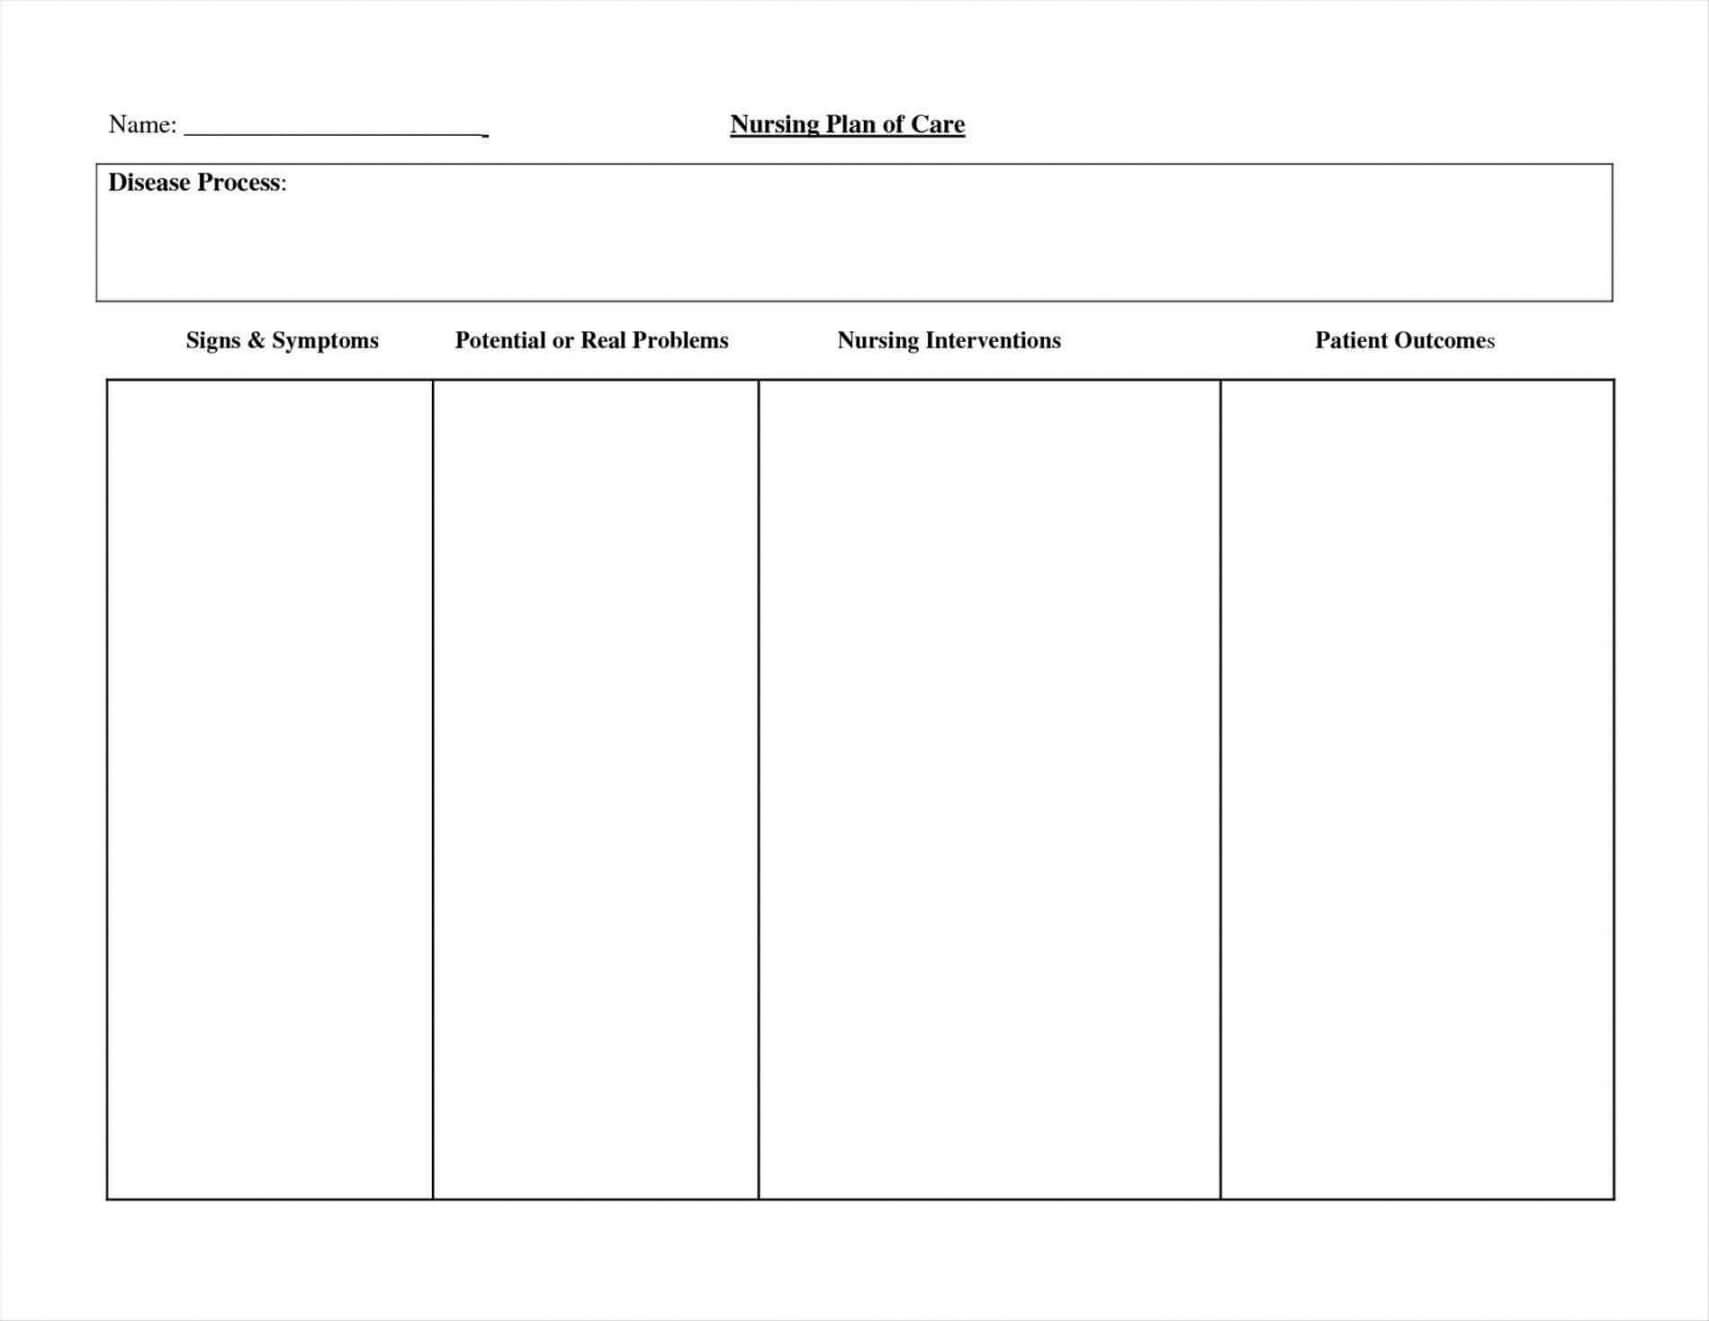 013 Best Nursing Care Plan Templates Blank Free Template Art With Regard To Nursing Care Plan Templates Blank